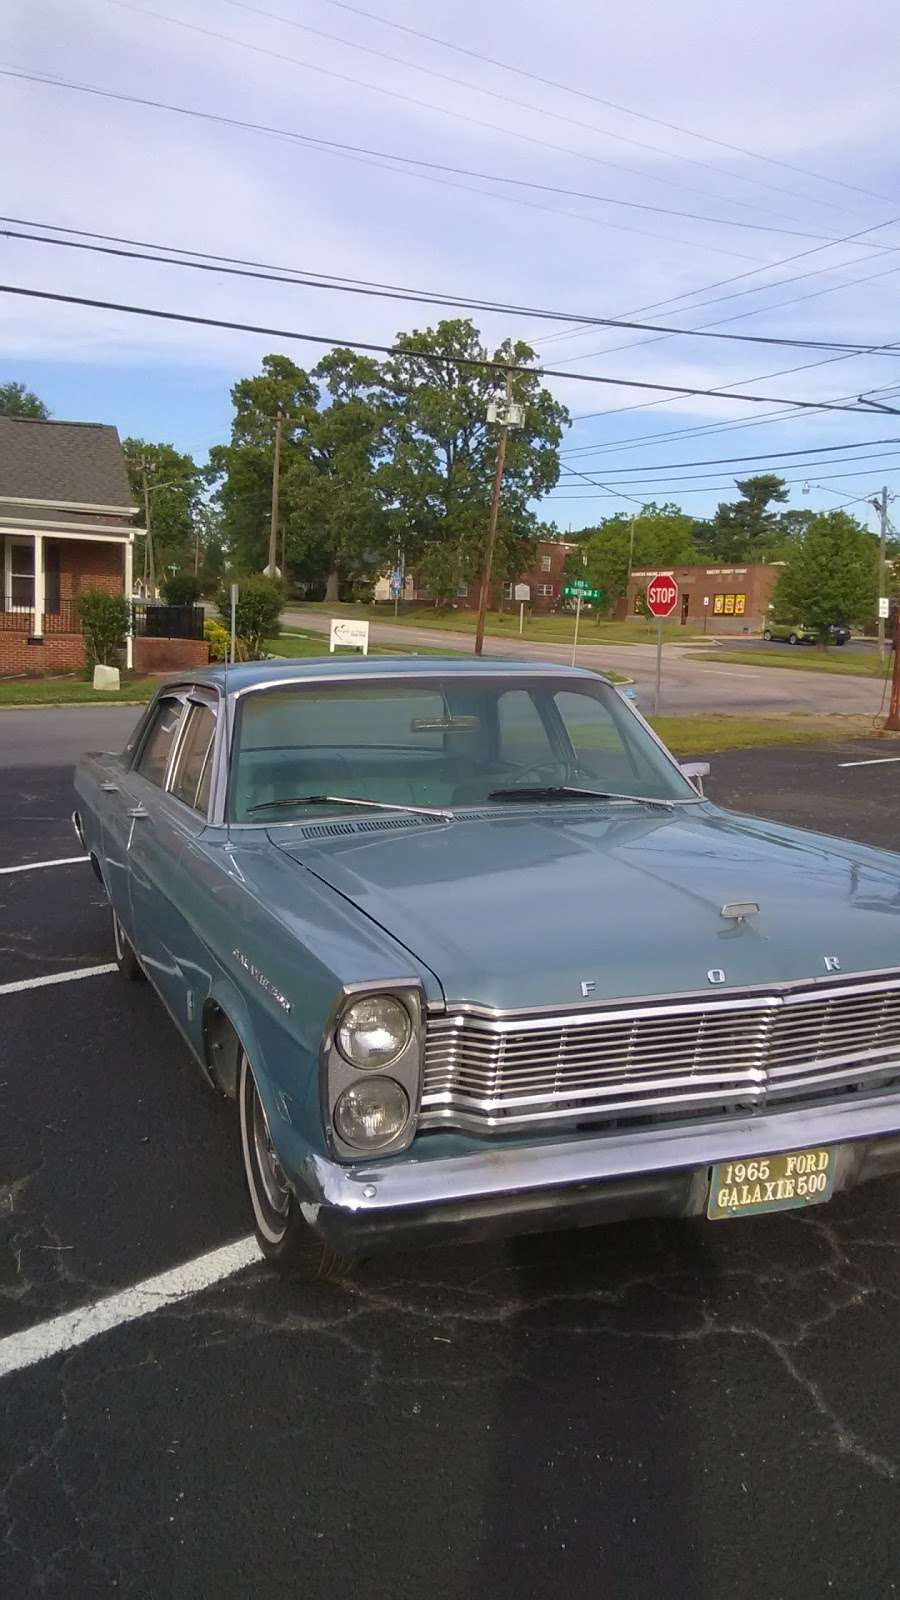 MrCs Automotive Repair And Restoration - car repair  | Photo 5 of 10 | Address: 114 E 12th St, Salisbury, NC 28144, USA | Phone: (336) 554-5501